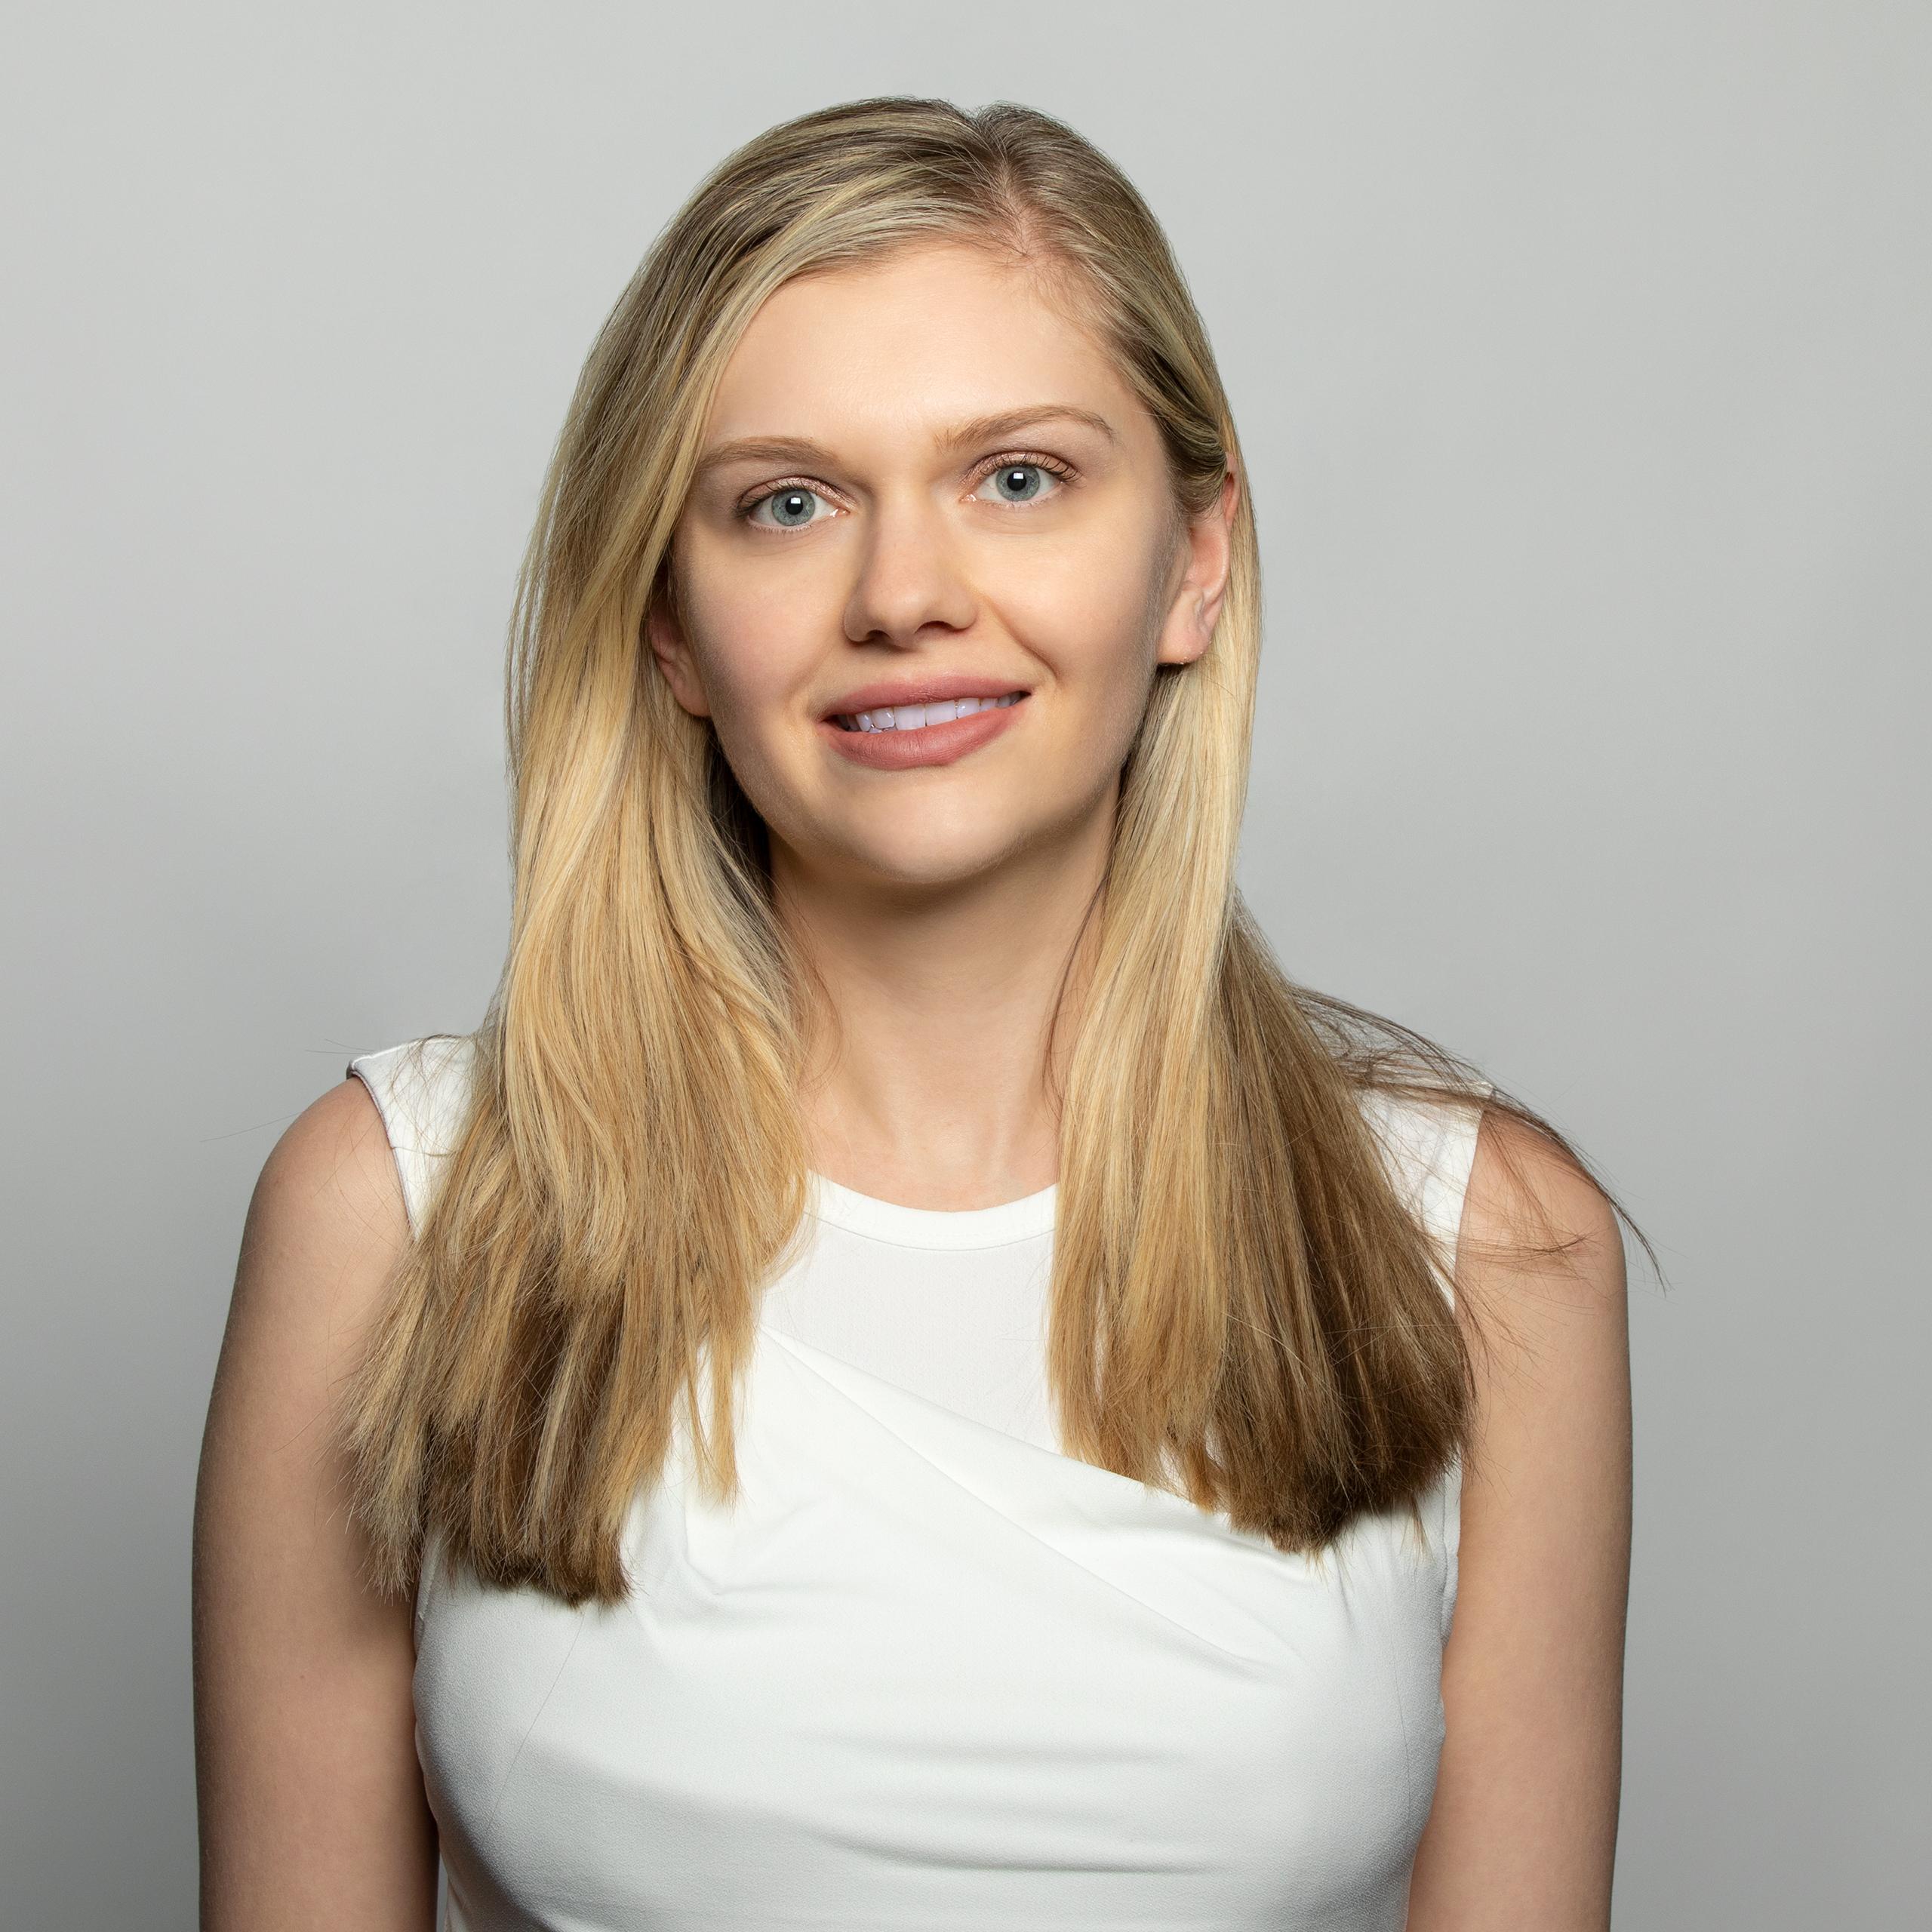 Dr. Emily Guarnotta, Clinical Psychologist